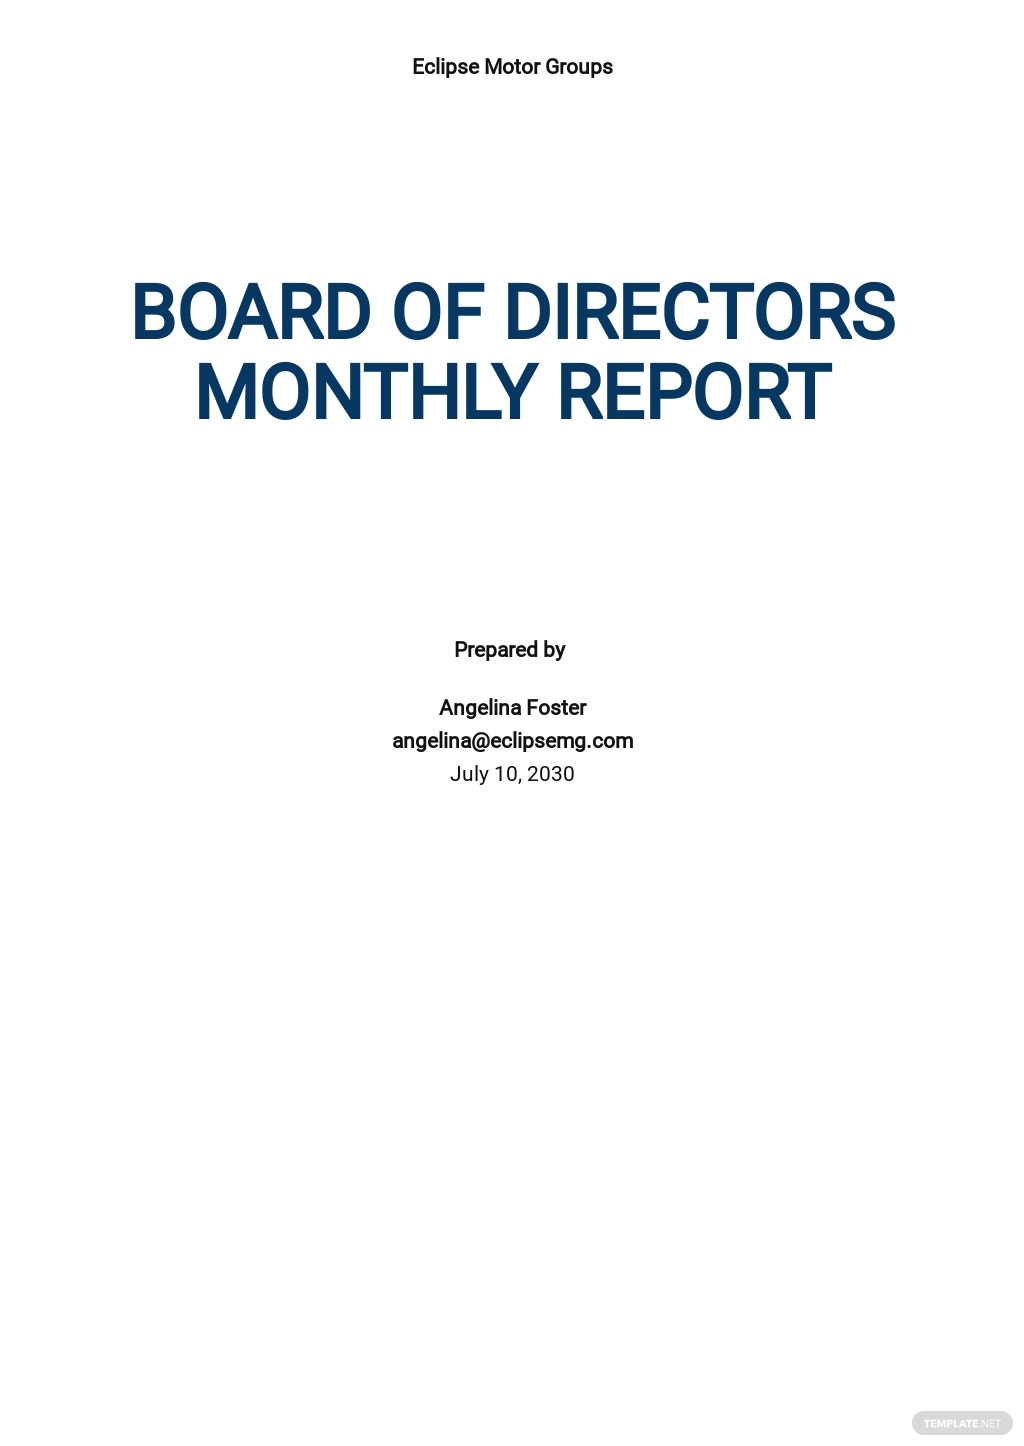 Board of Directors Report Template